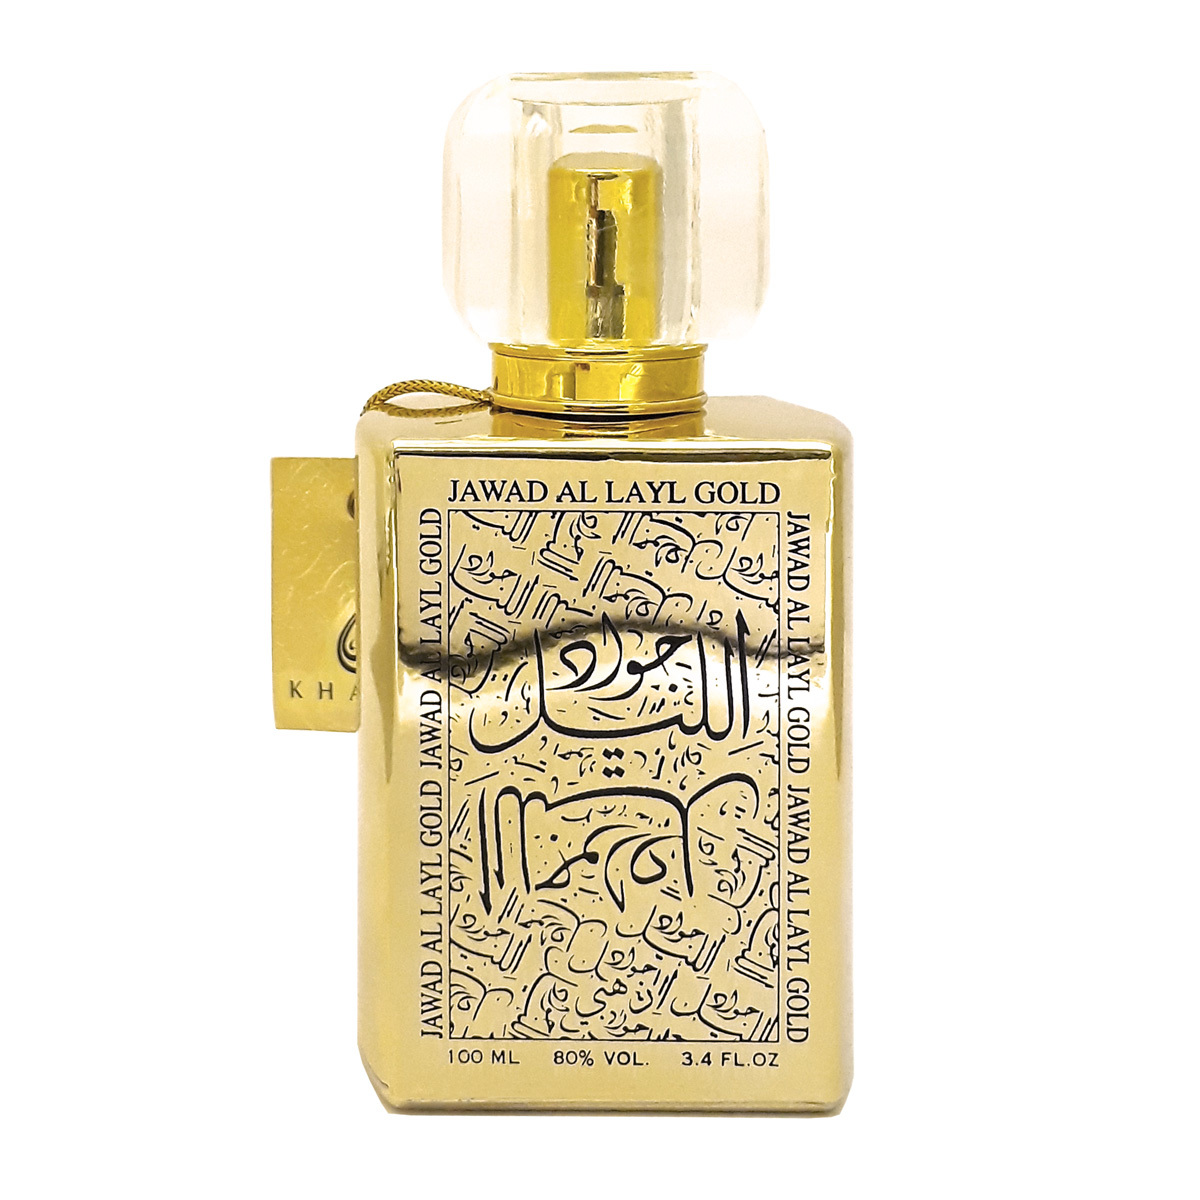 Jawad al Layl Gold / Джавад аль Лайл Золото 100 мл спрей от Халис Khalis Perfumes